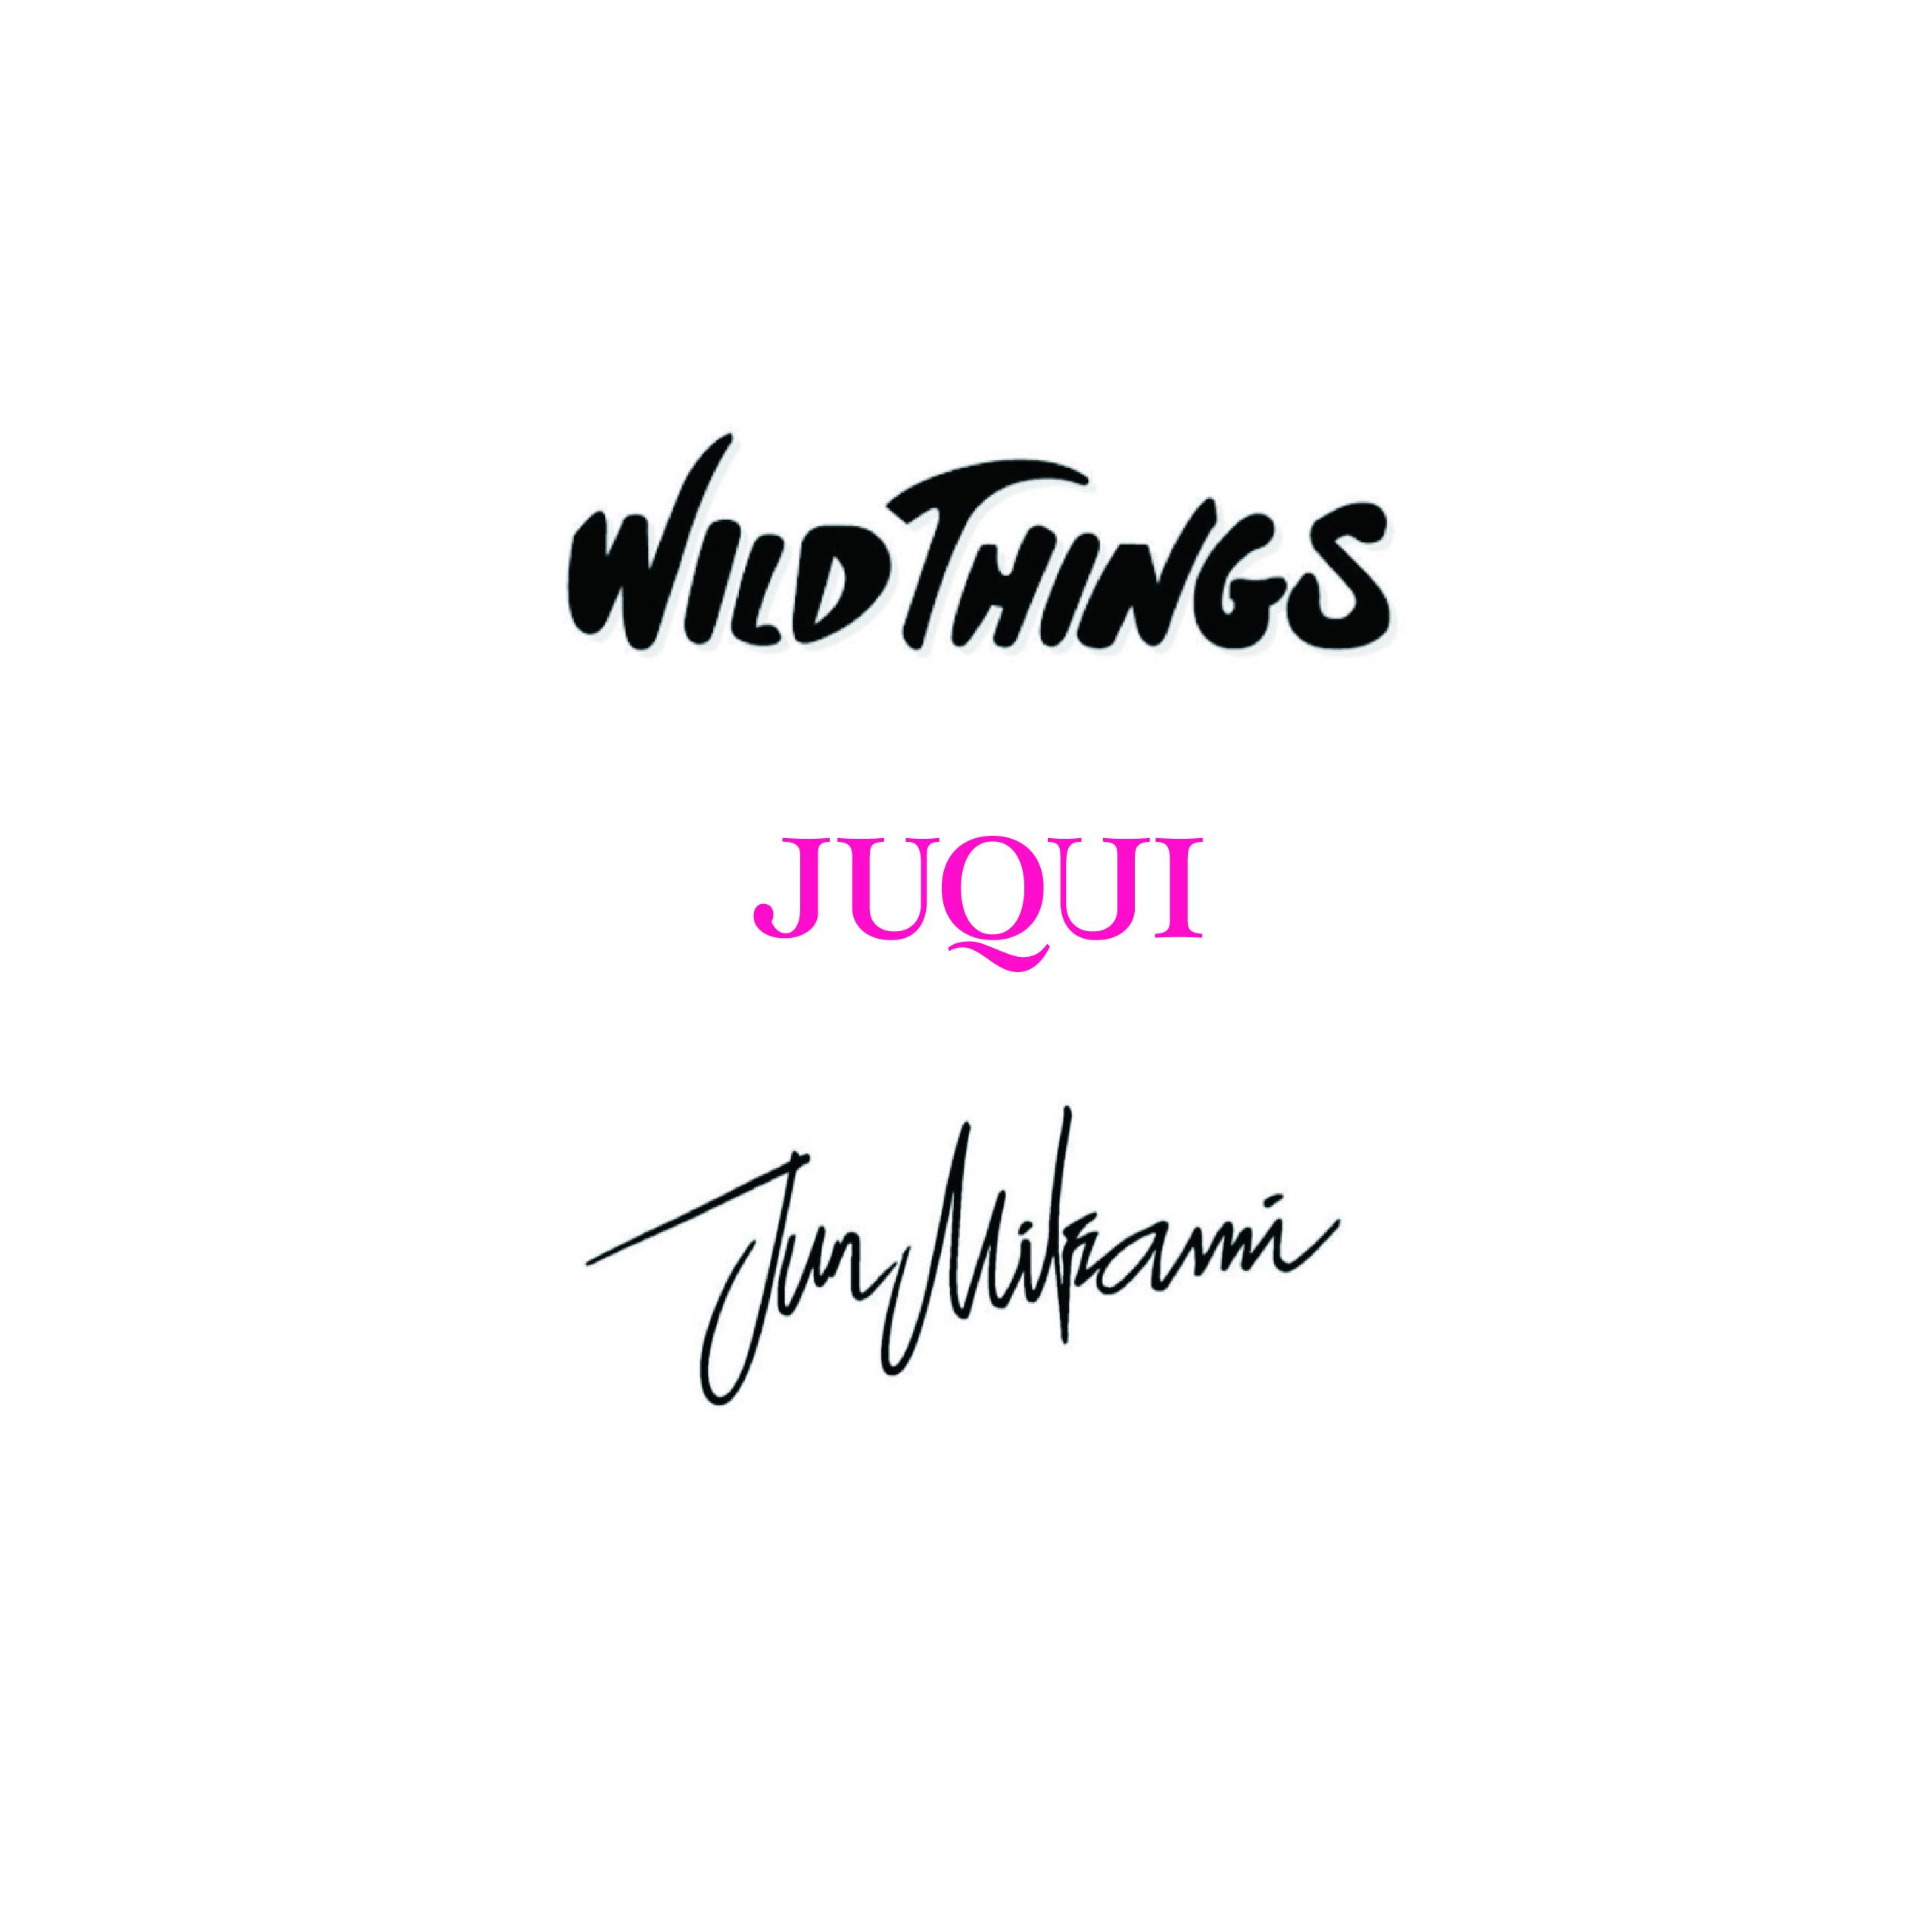 【WILD THINGS×JUN MIKAMI】